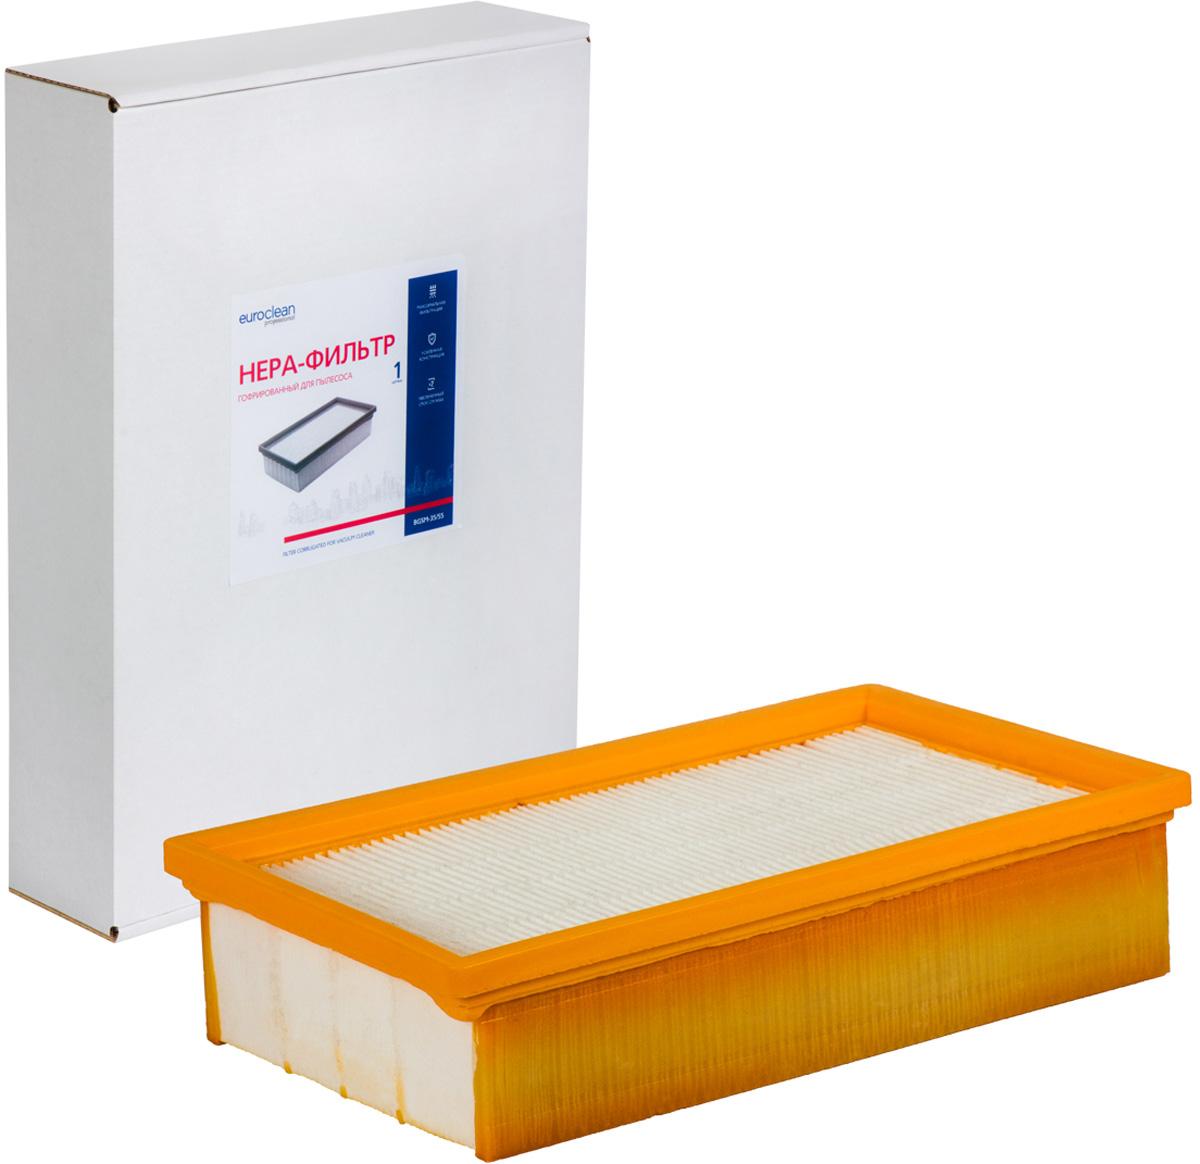 Euroclean BGSM-35/55 фильтр складчатый для пылесоса BOSCH (аналог 2 607 432 034) euroclean bgpm 35 55 фильтр складчатый для пылесоса bosch аналог 2 607 432 033